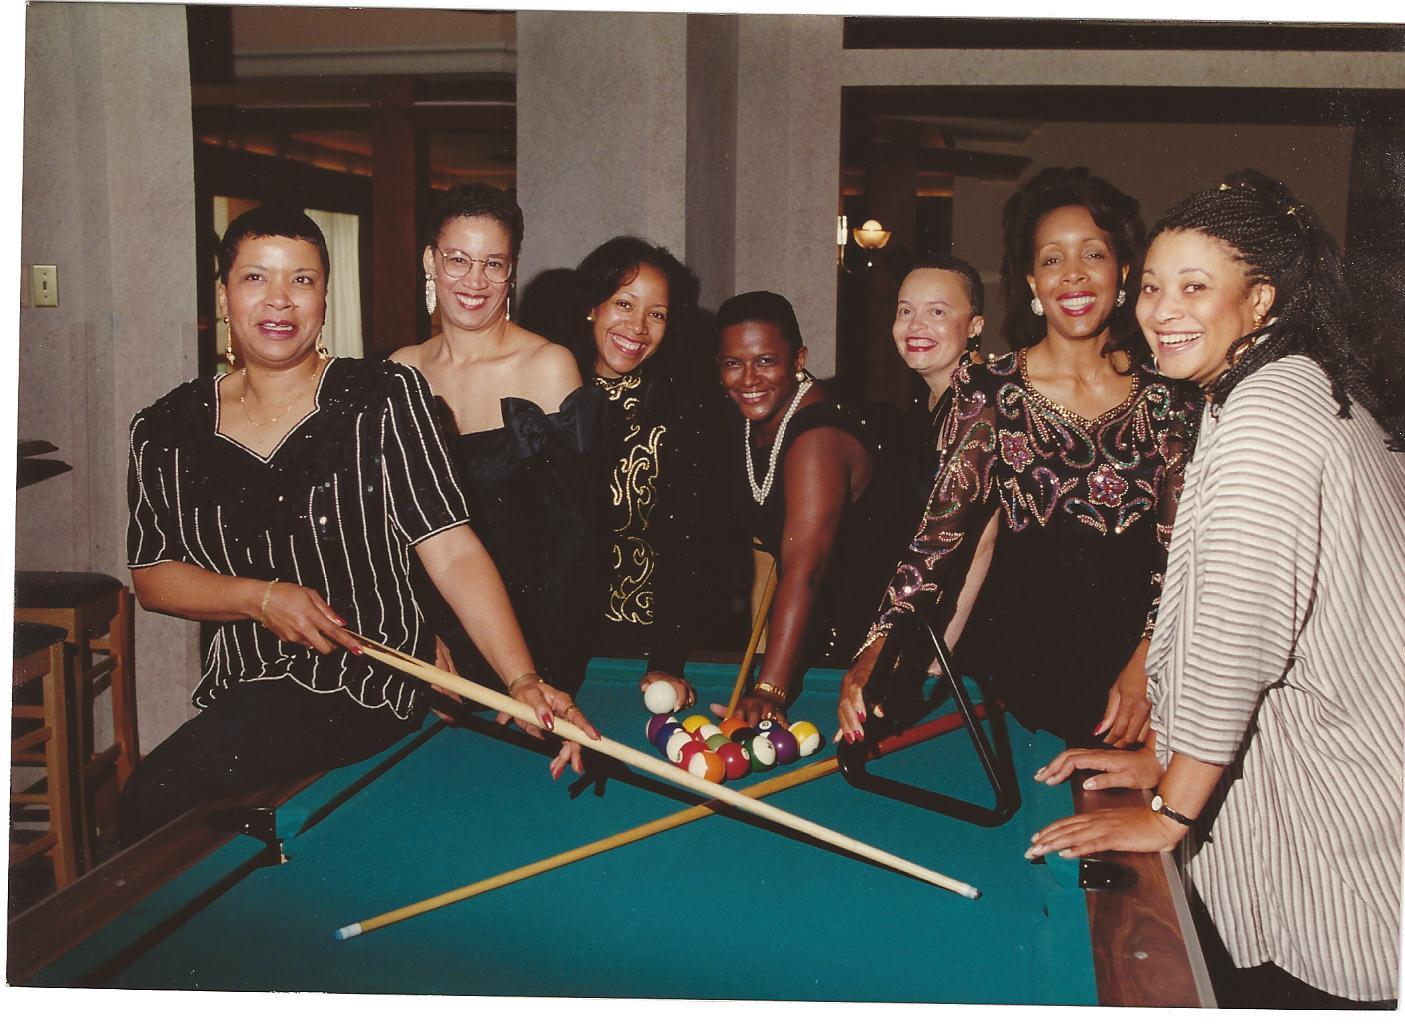 1994 Reunion in New York. From left: Lorene (Street) Wilkerson '69, Joyce (Barnett) Montague '69, Lavida (Robinson) Allen '72, Renaye (Brown) Cuyler '70, Charlotte (Matthews) Harris '69, Jacquelyn Lendsey '71, and Diane (Hunter)  Hazel '69.